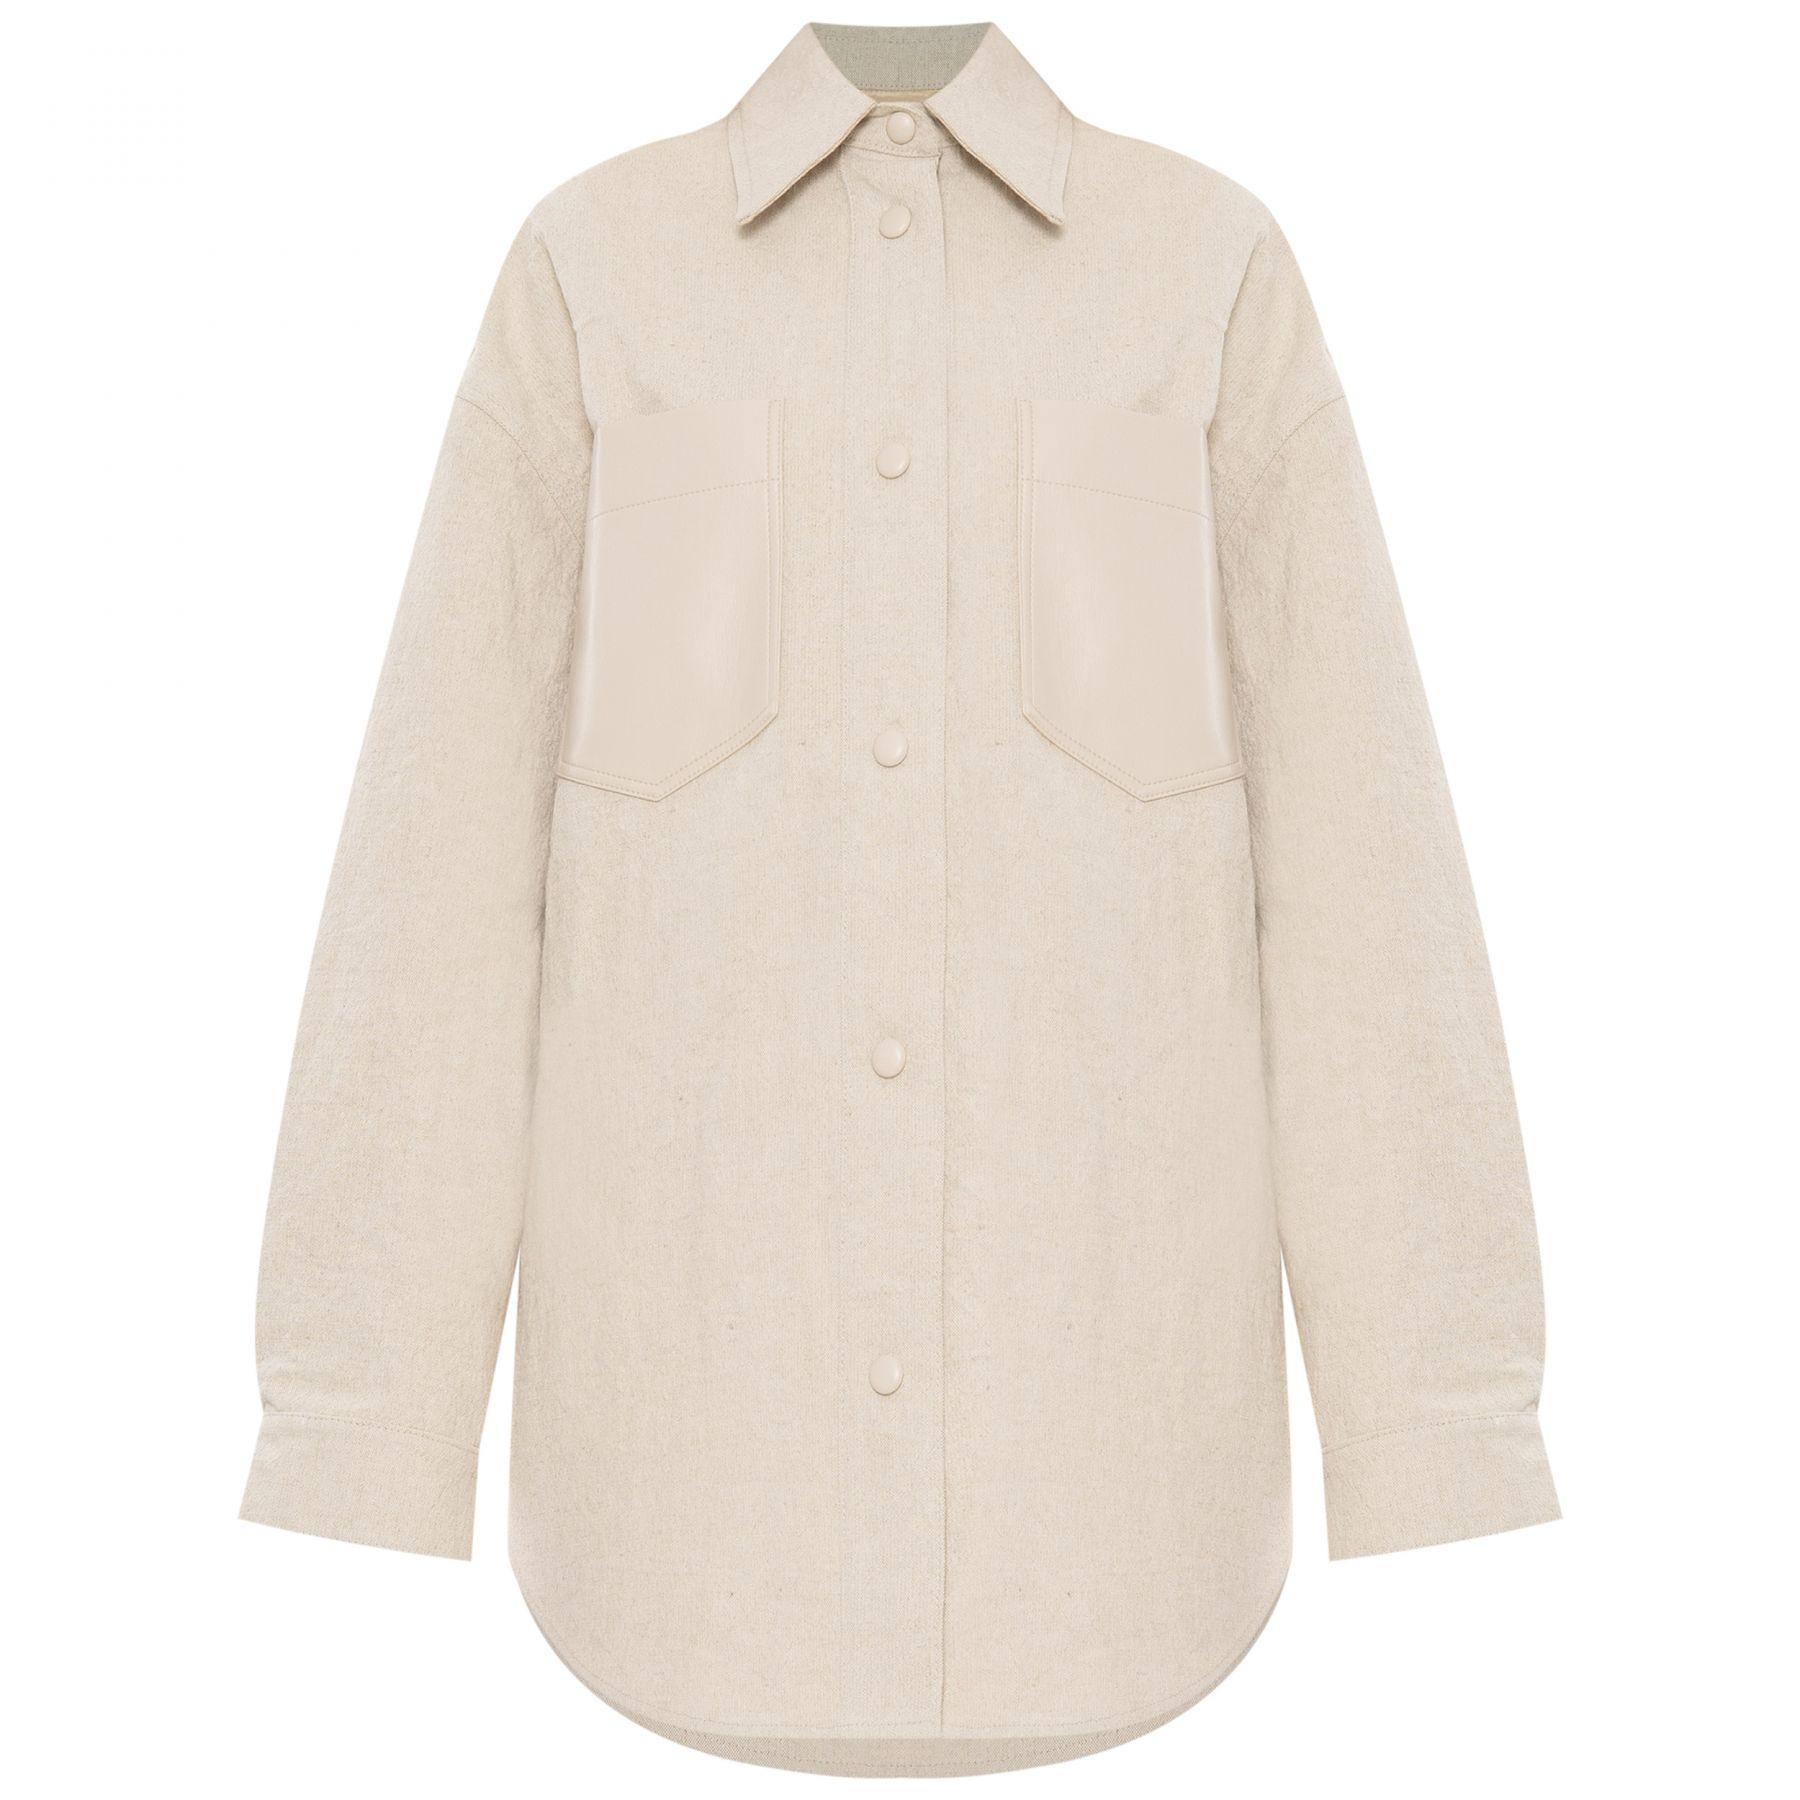 Рубашка с длинными рукавами Nanushka Reign светло-бежевая